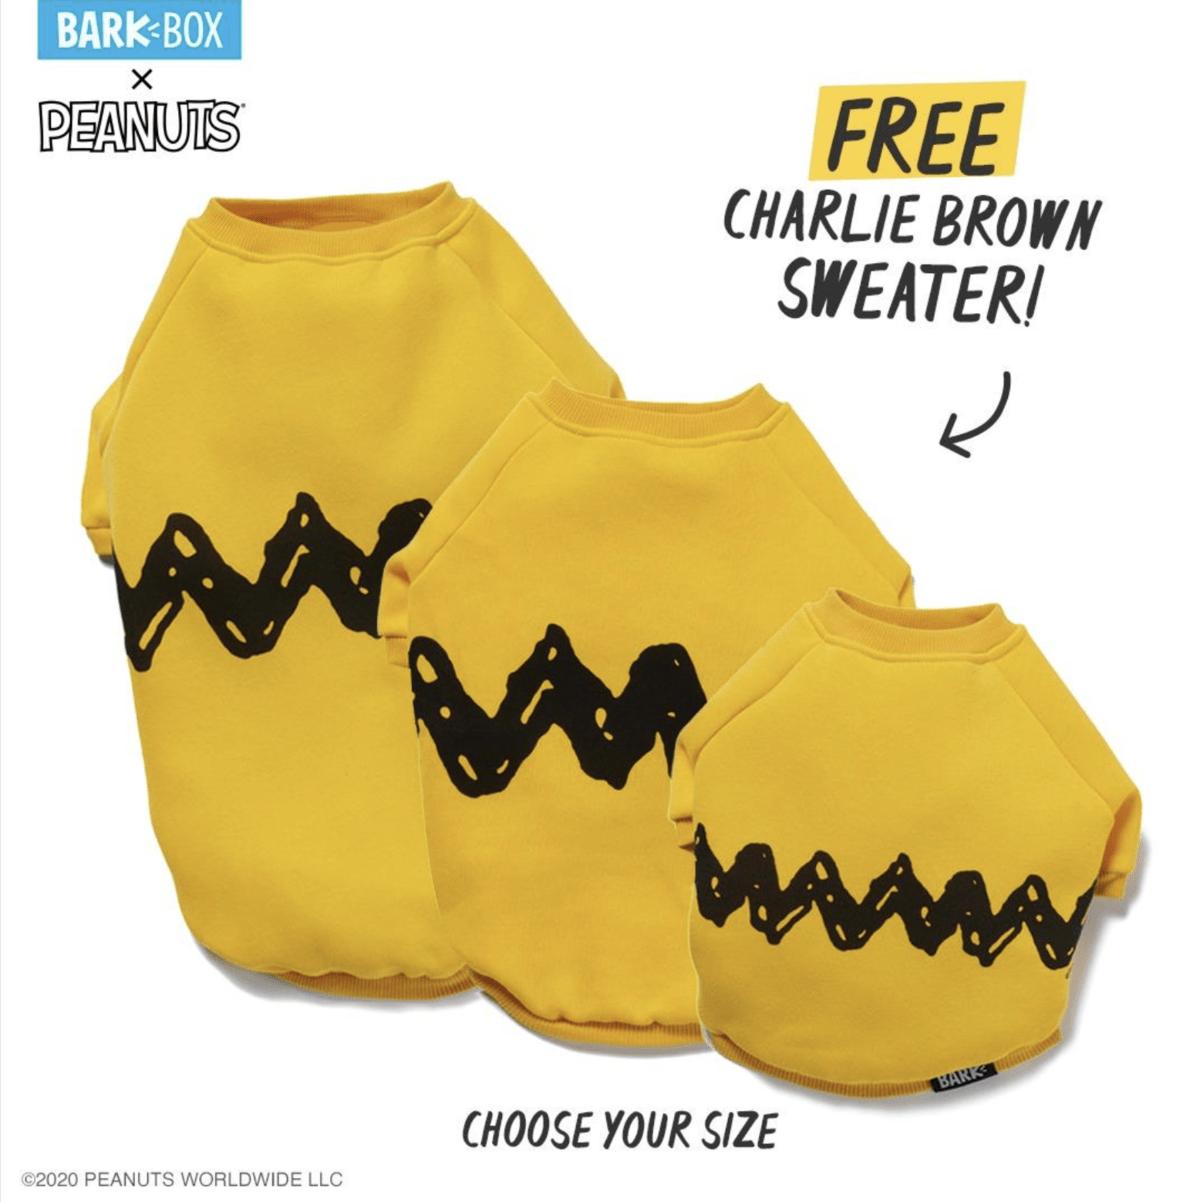 BarkBox Coupon Code – Free Charlie Brown Sweater!